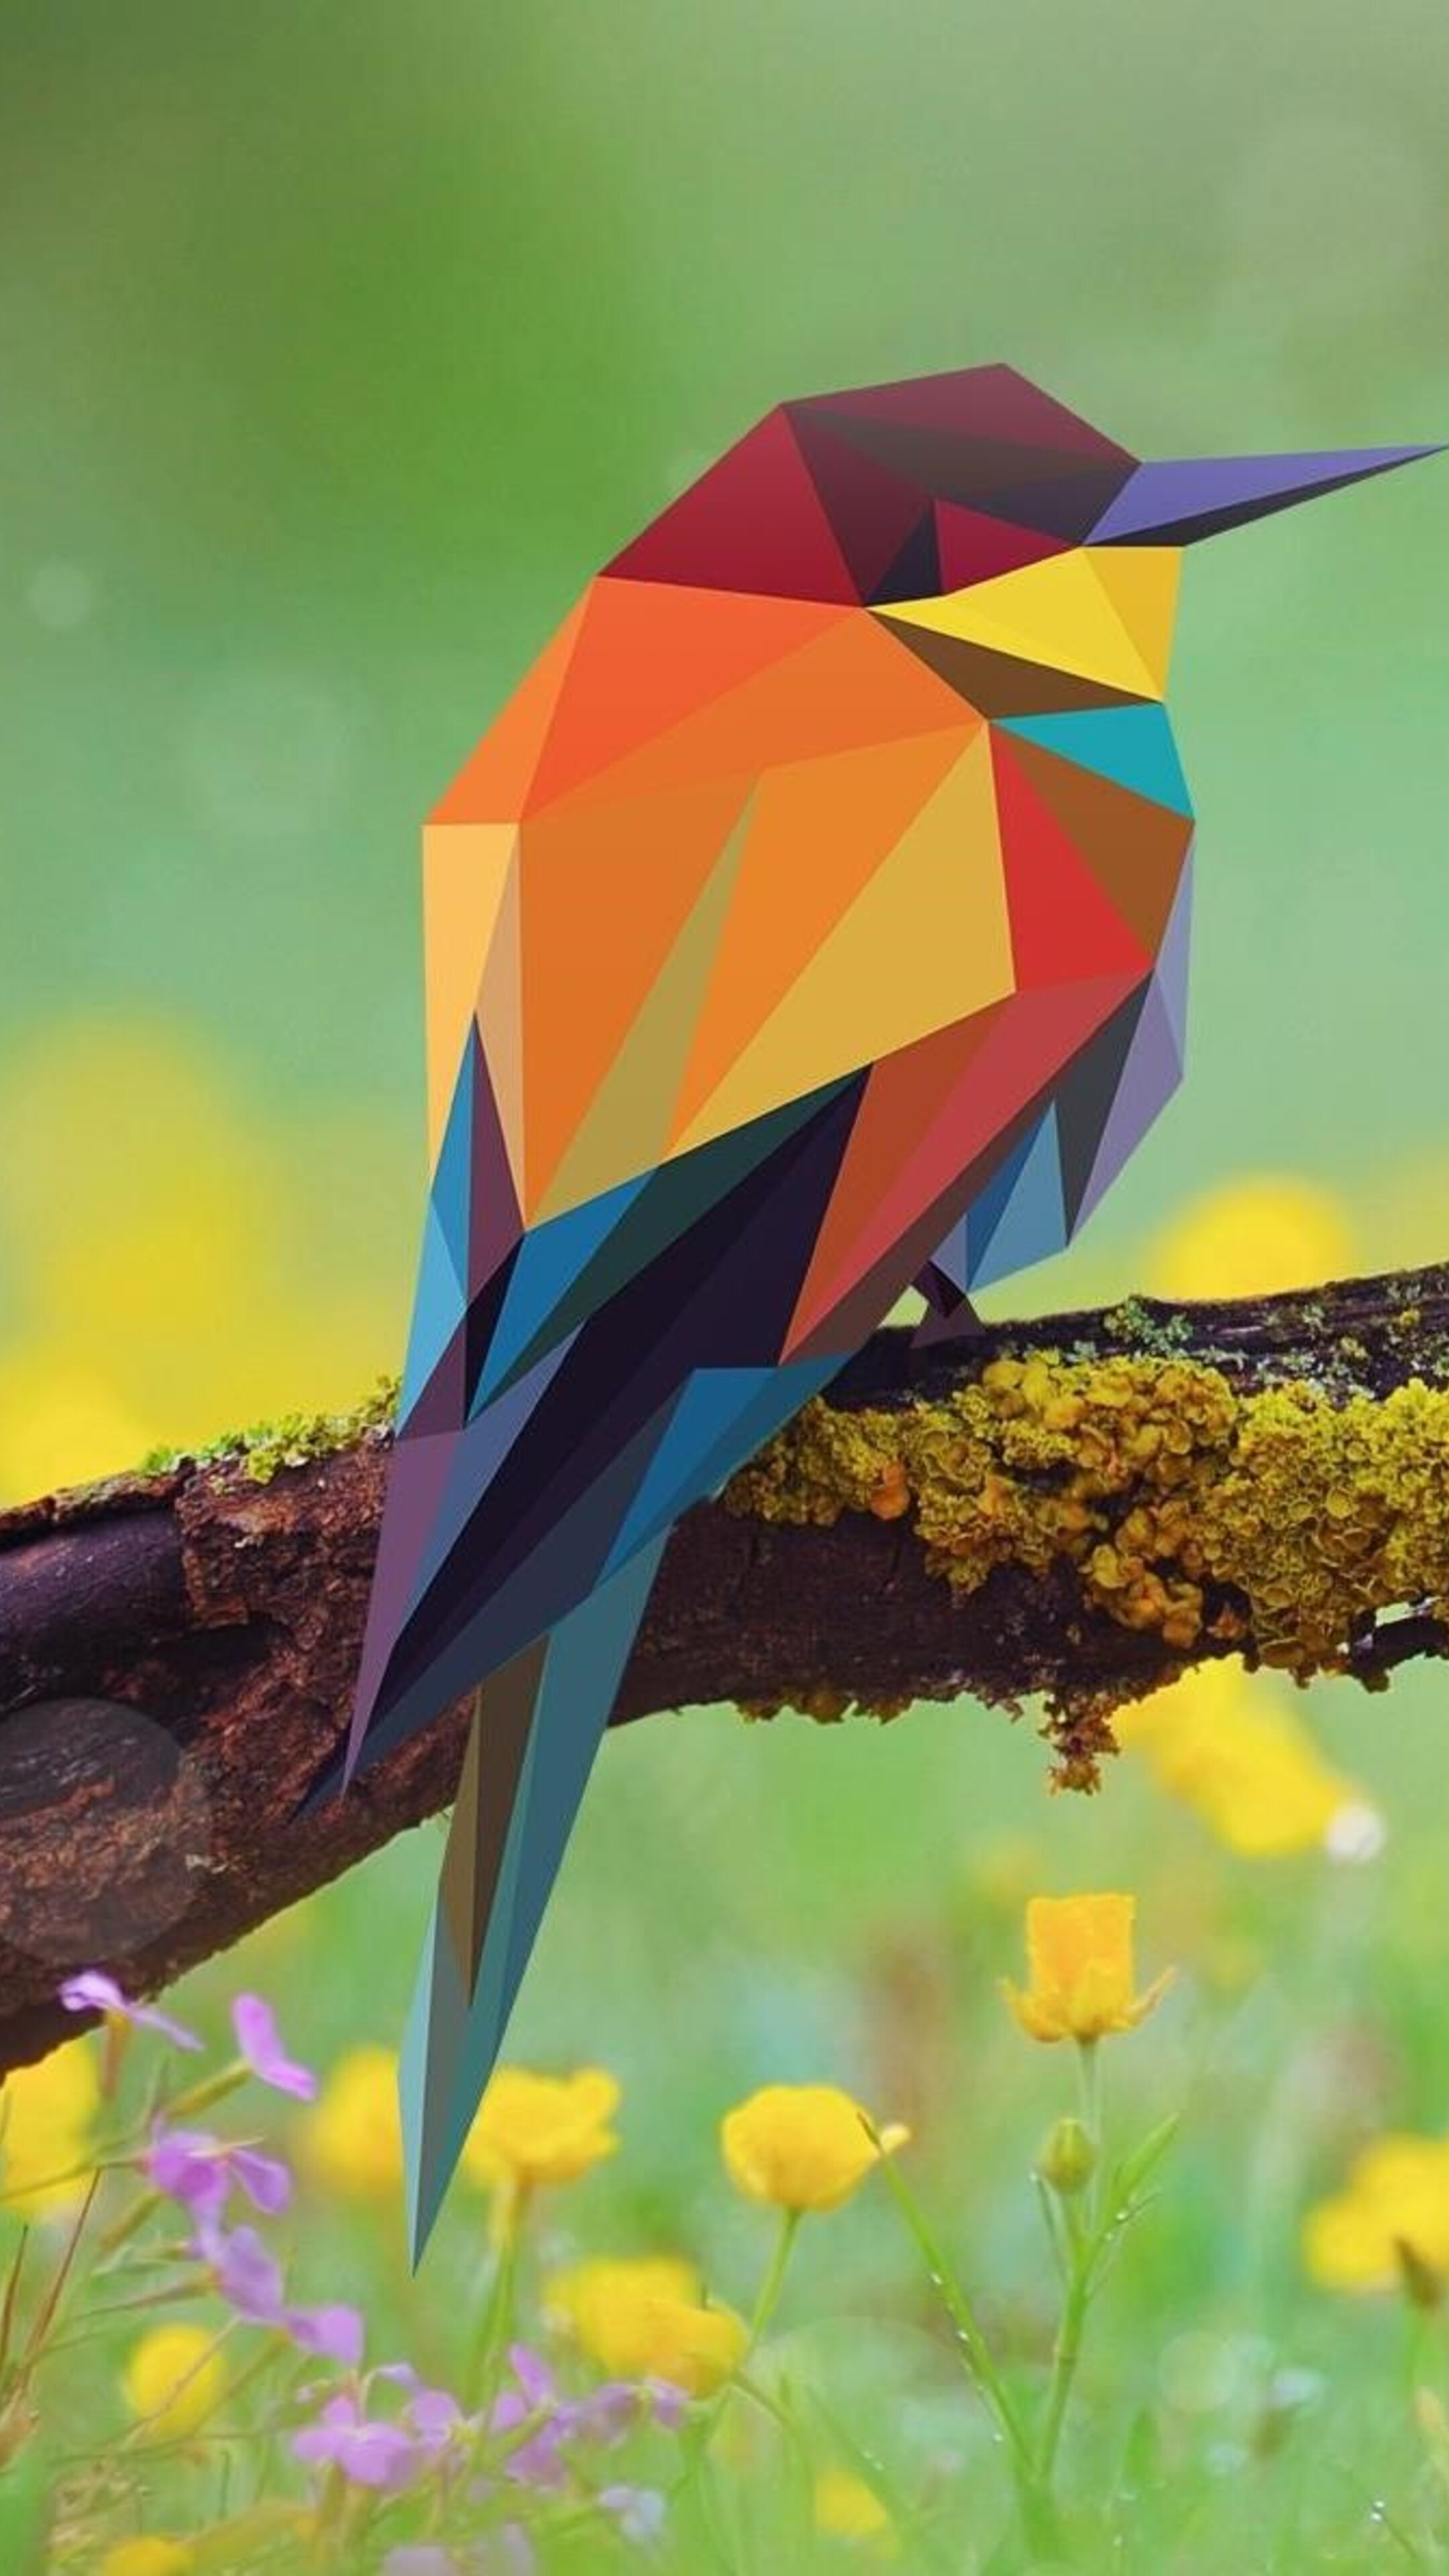 2160x3840 bird abstract art sony xperia x xz z5 premium hd - Art wallpaper 2160x3840 ...